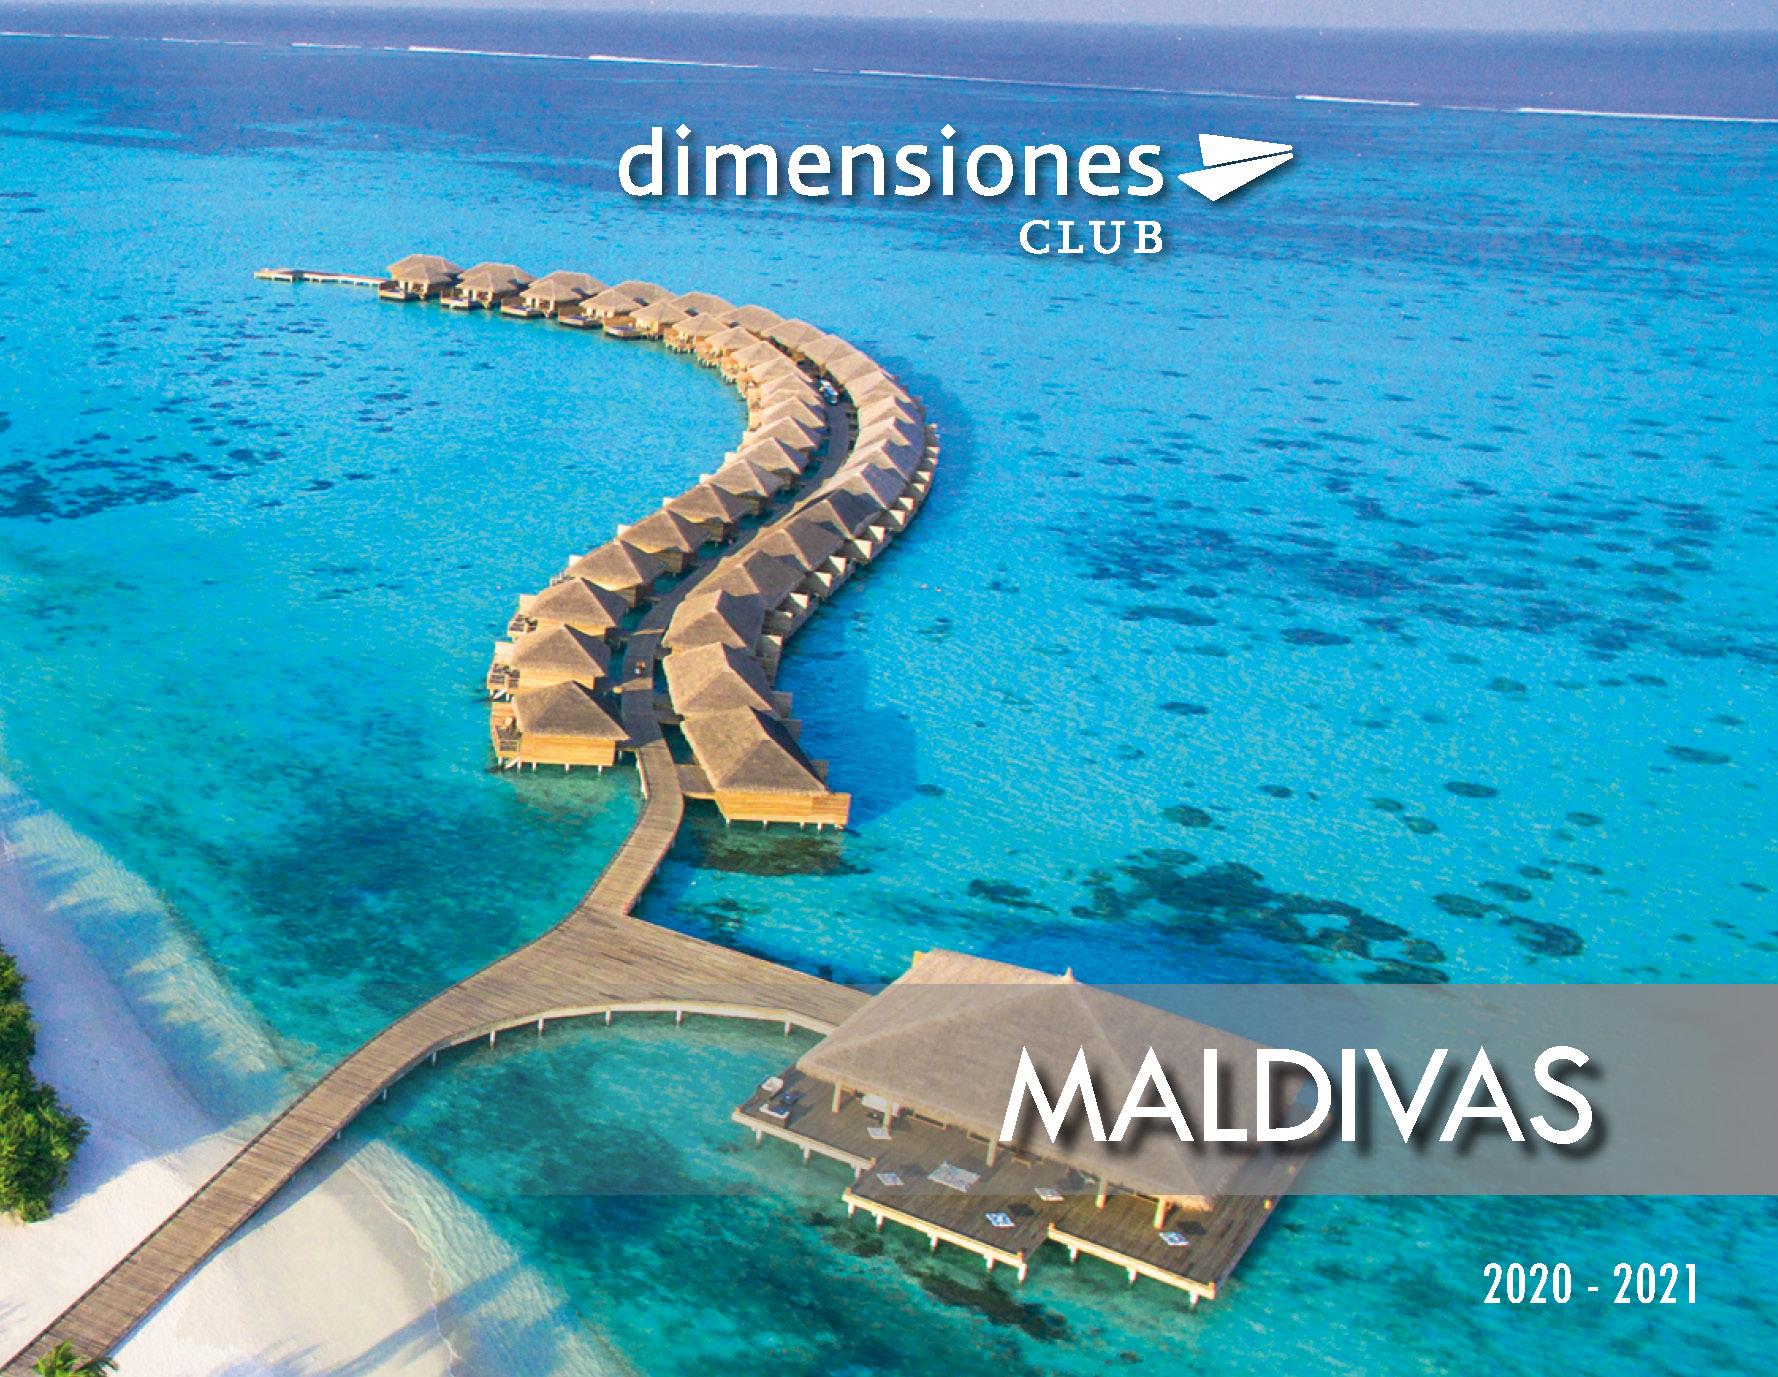 Catalogo Dimensiones Maldivas 2020-2021